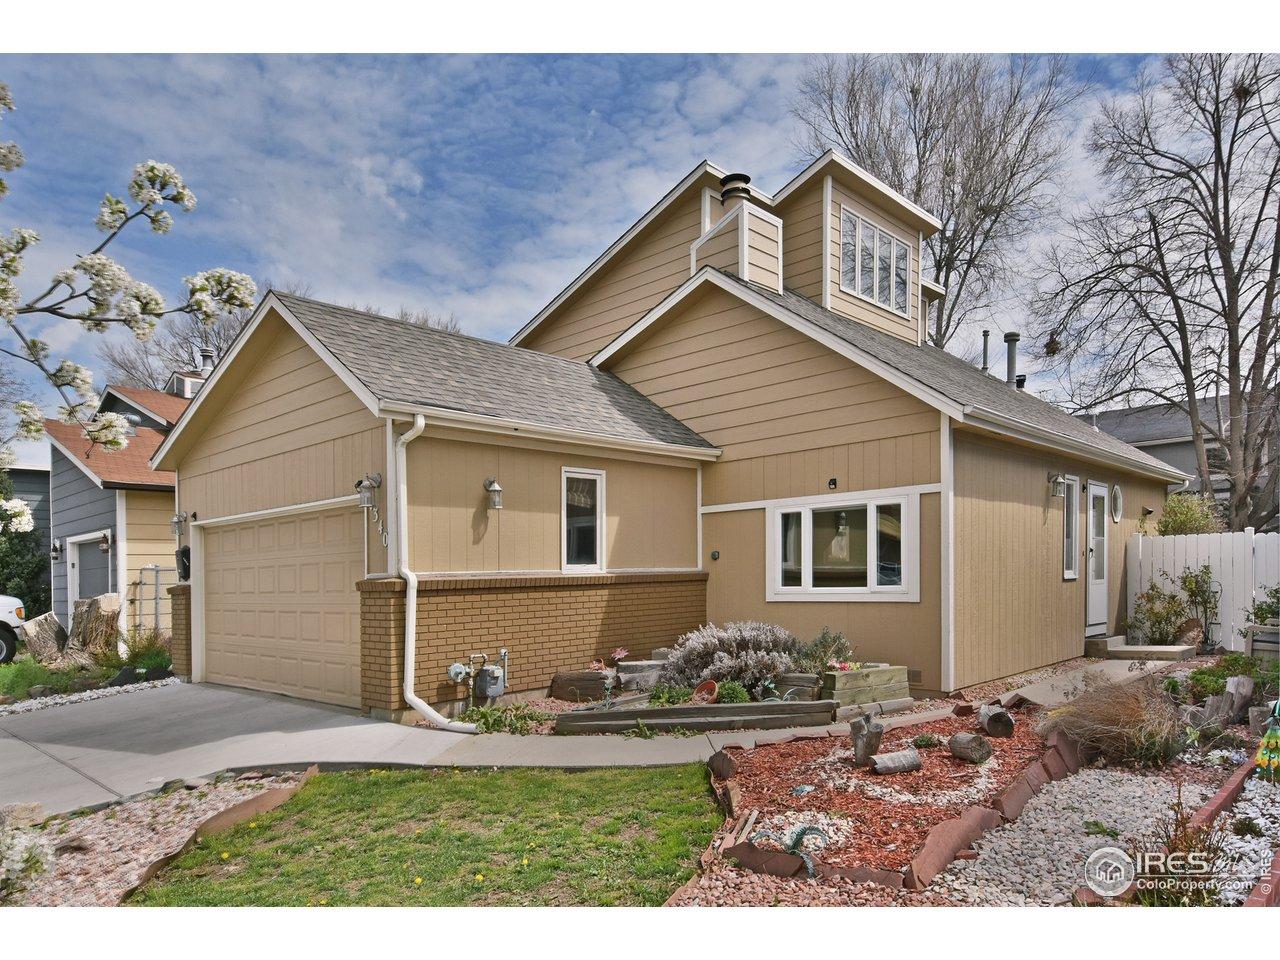 1340 Emery St, Longmont CO 80501